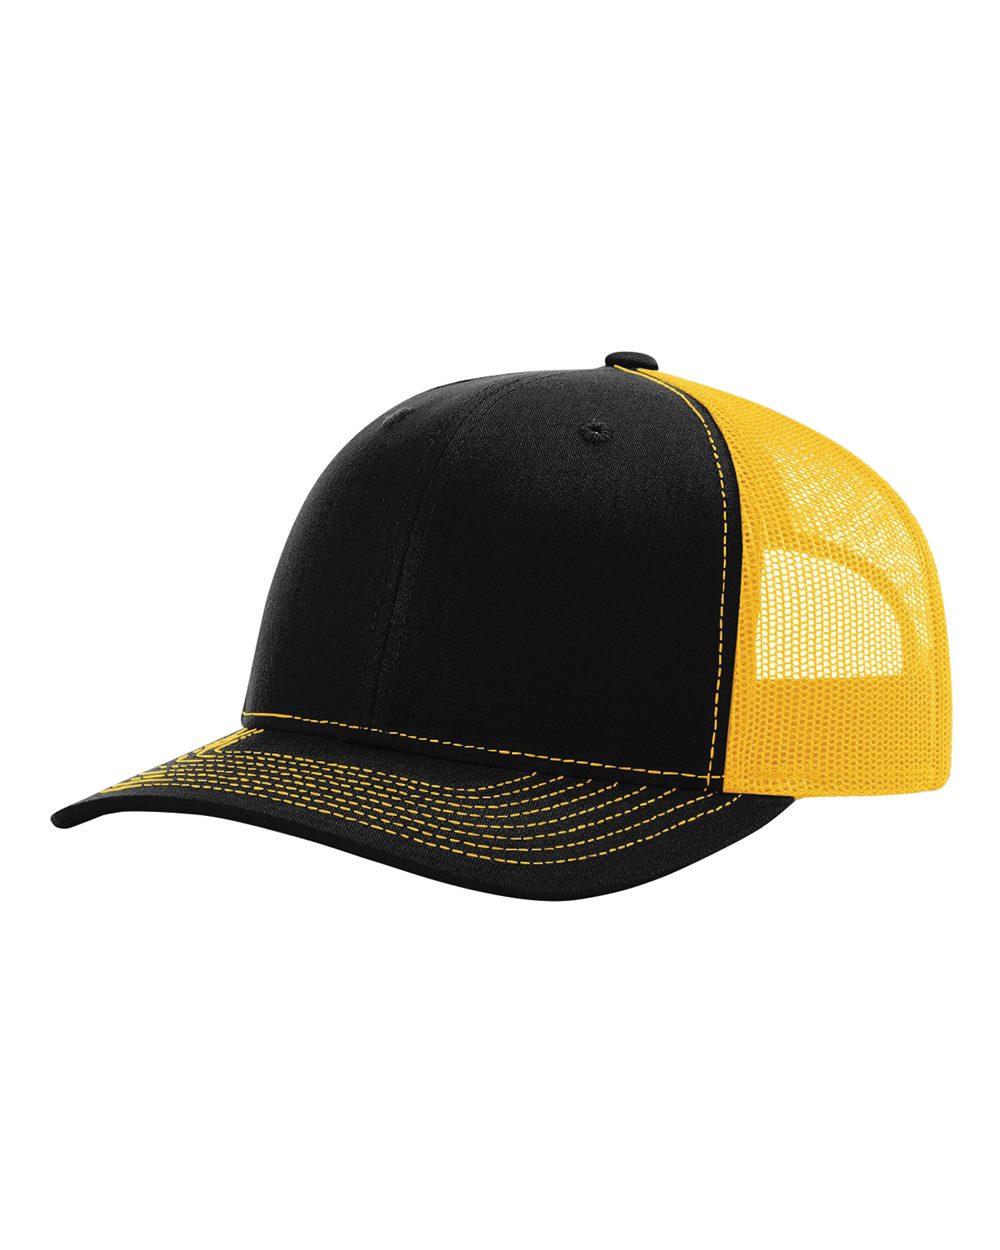 Richardson 112 - Trucker Snapback Cap  4.86 - Headwear c029965ce72